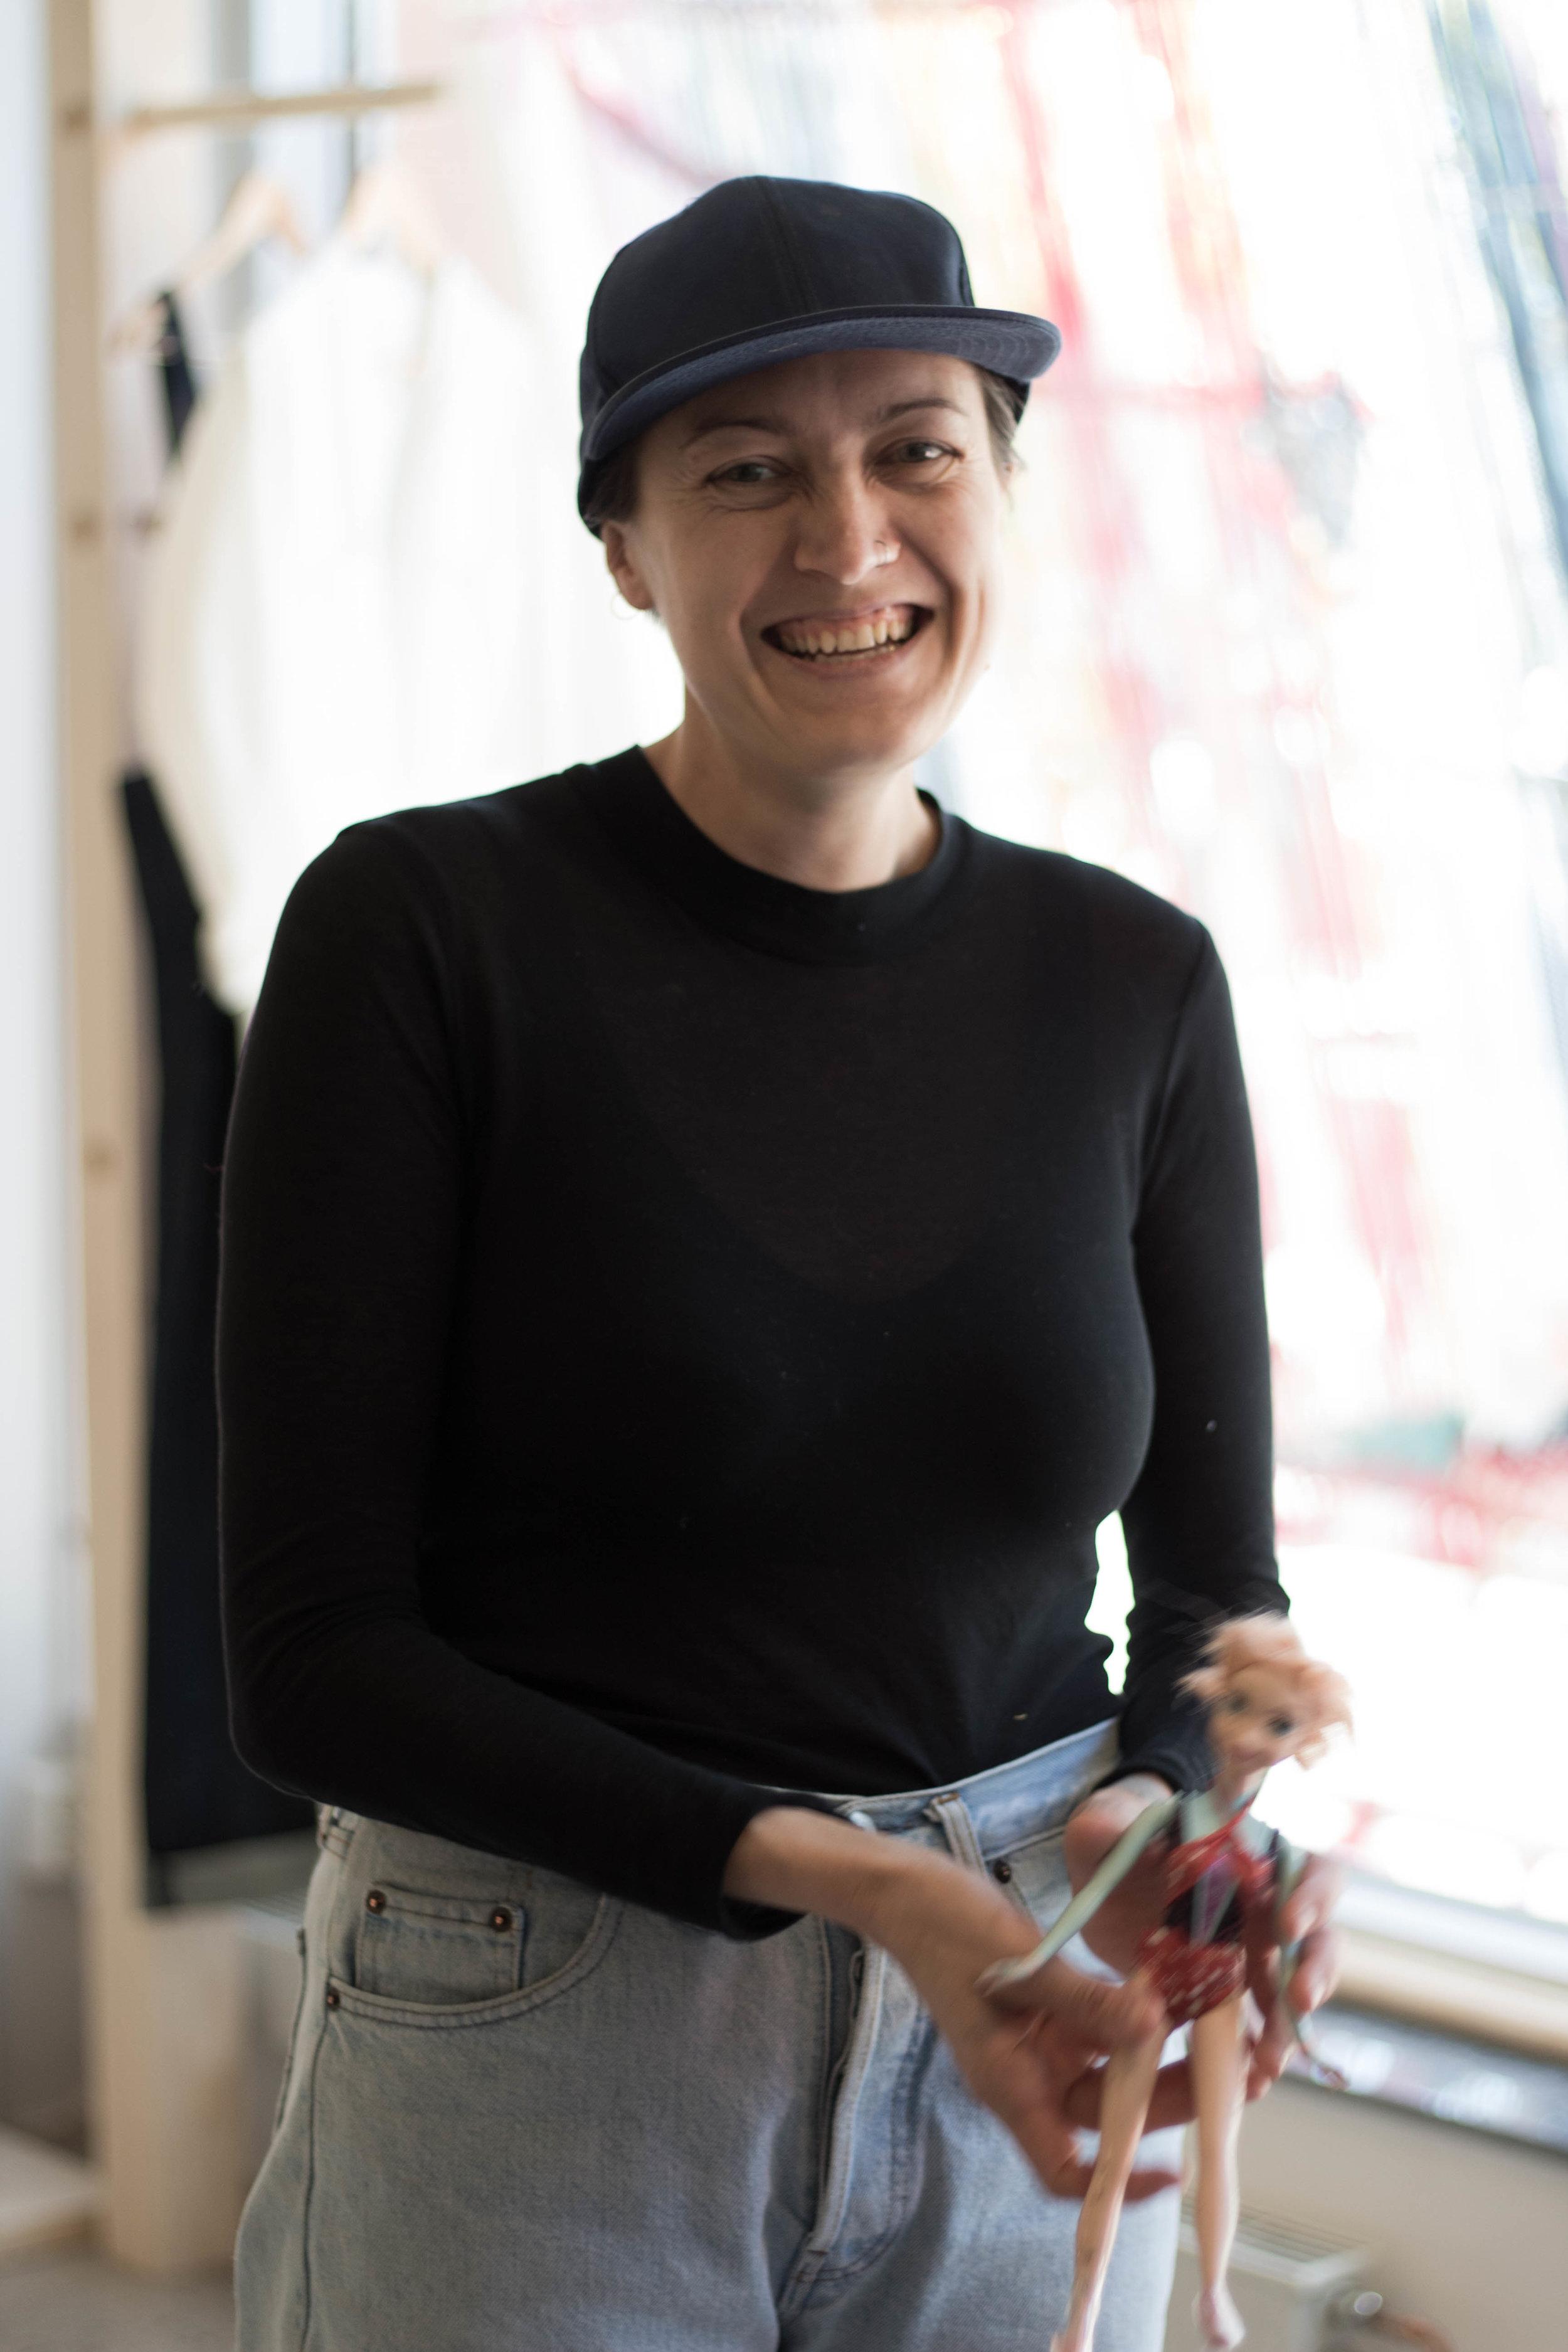 Birgitta Helmersson som driver Helgrose studio